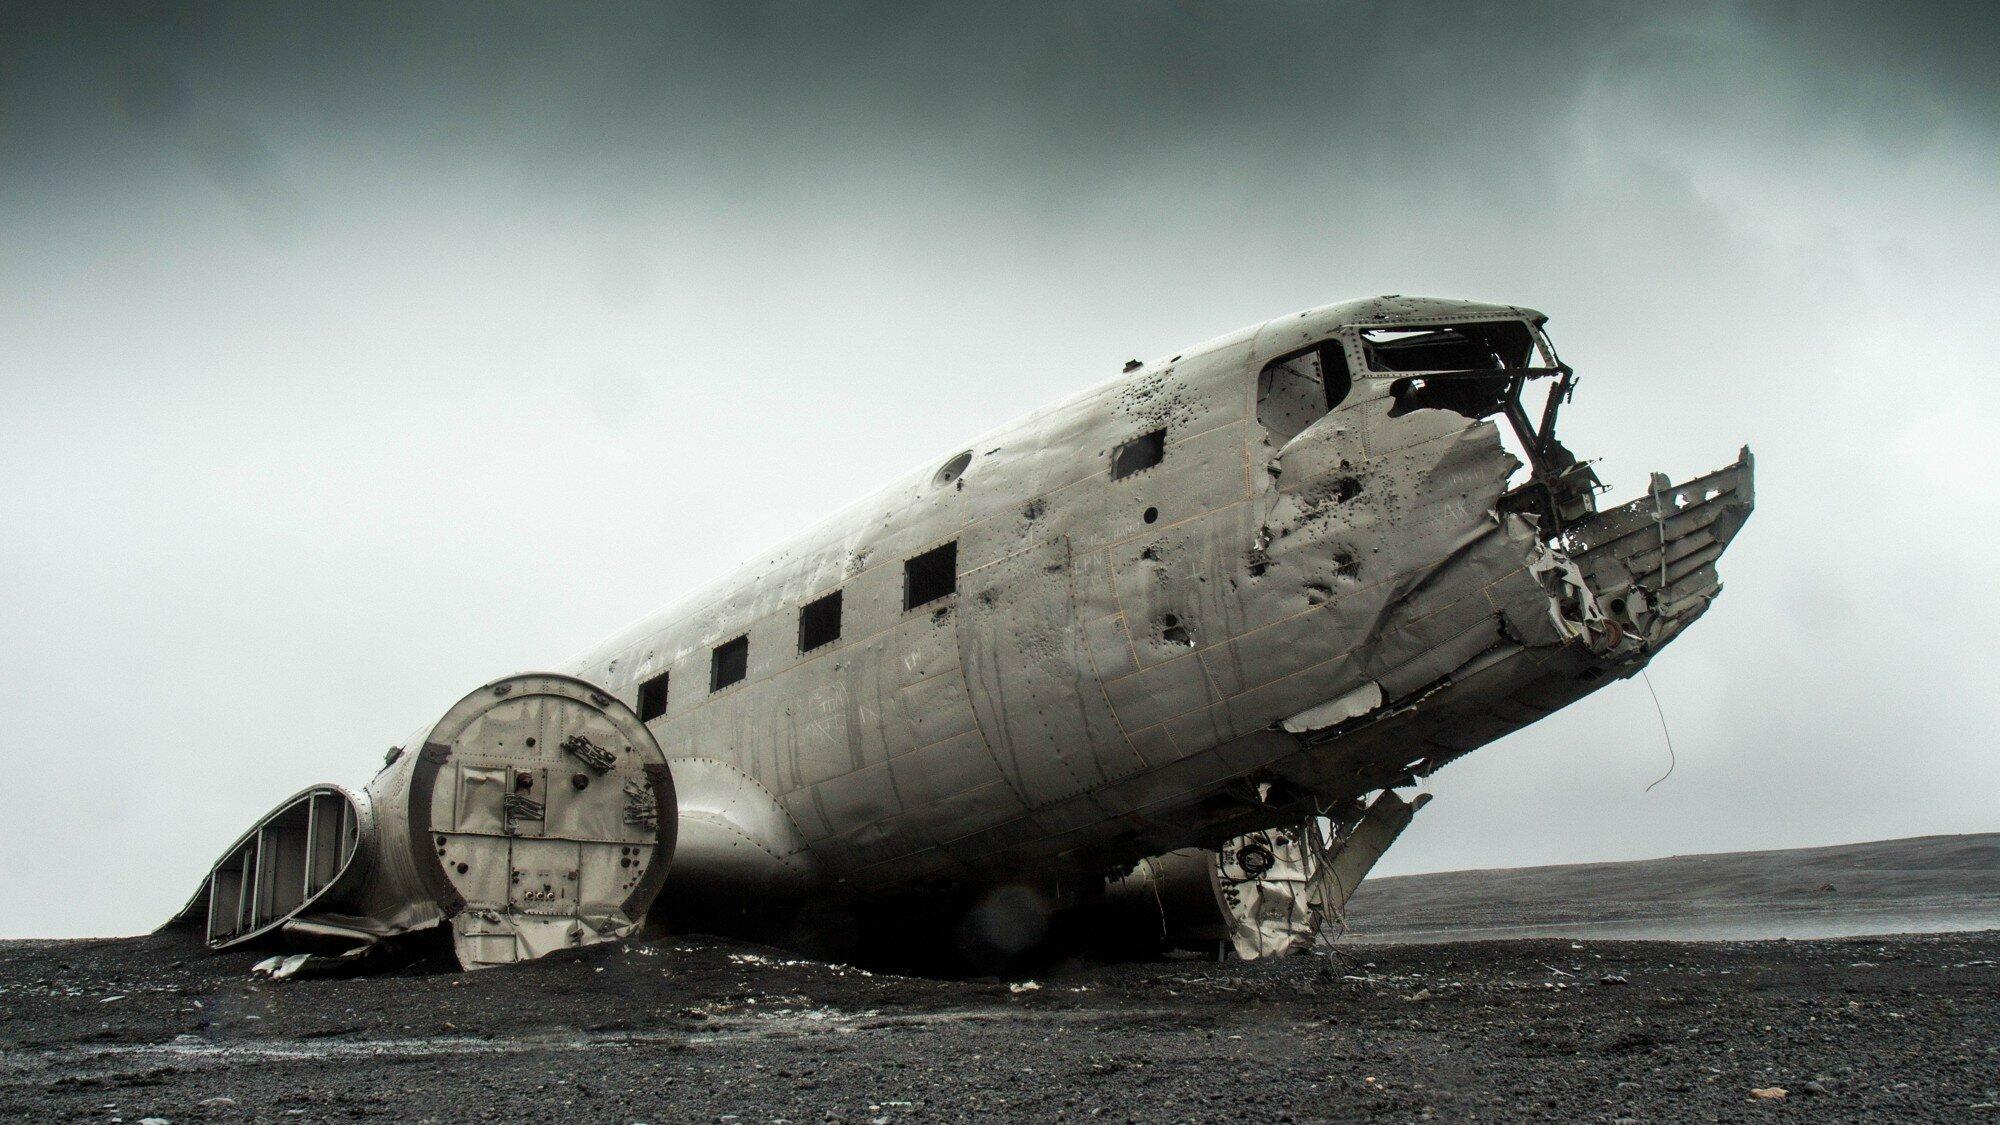 В Эквадоре разбился самолет: все люди на борту погибли (фото)